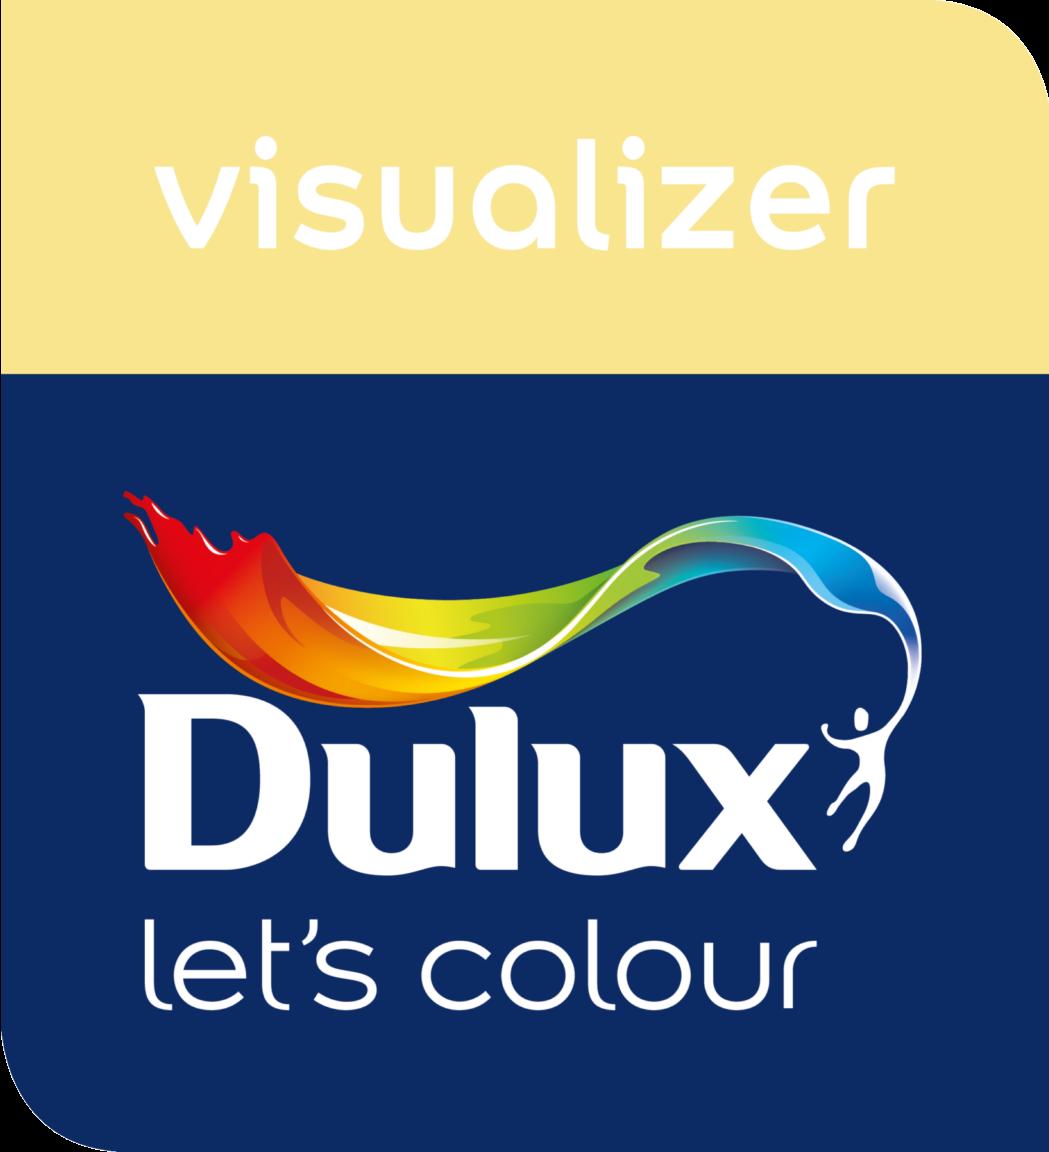 dulux augmented app